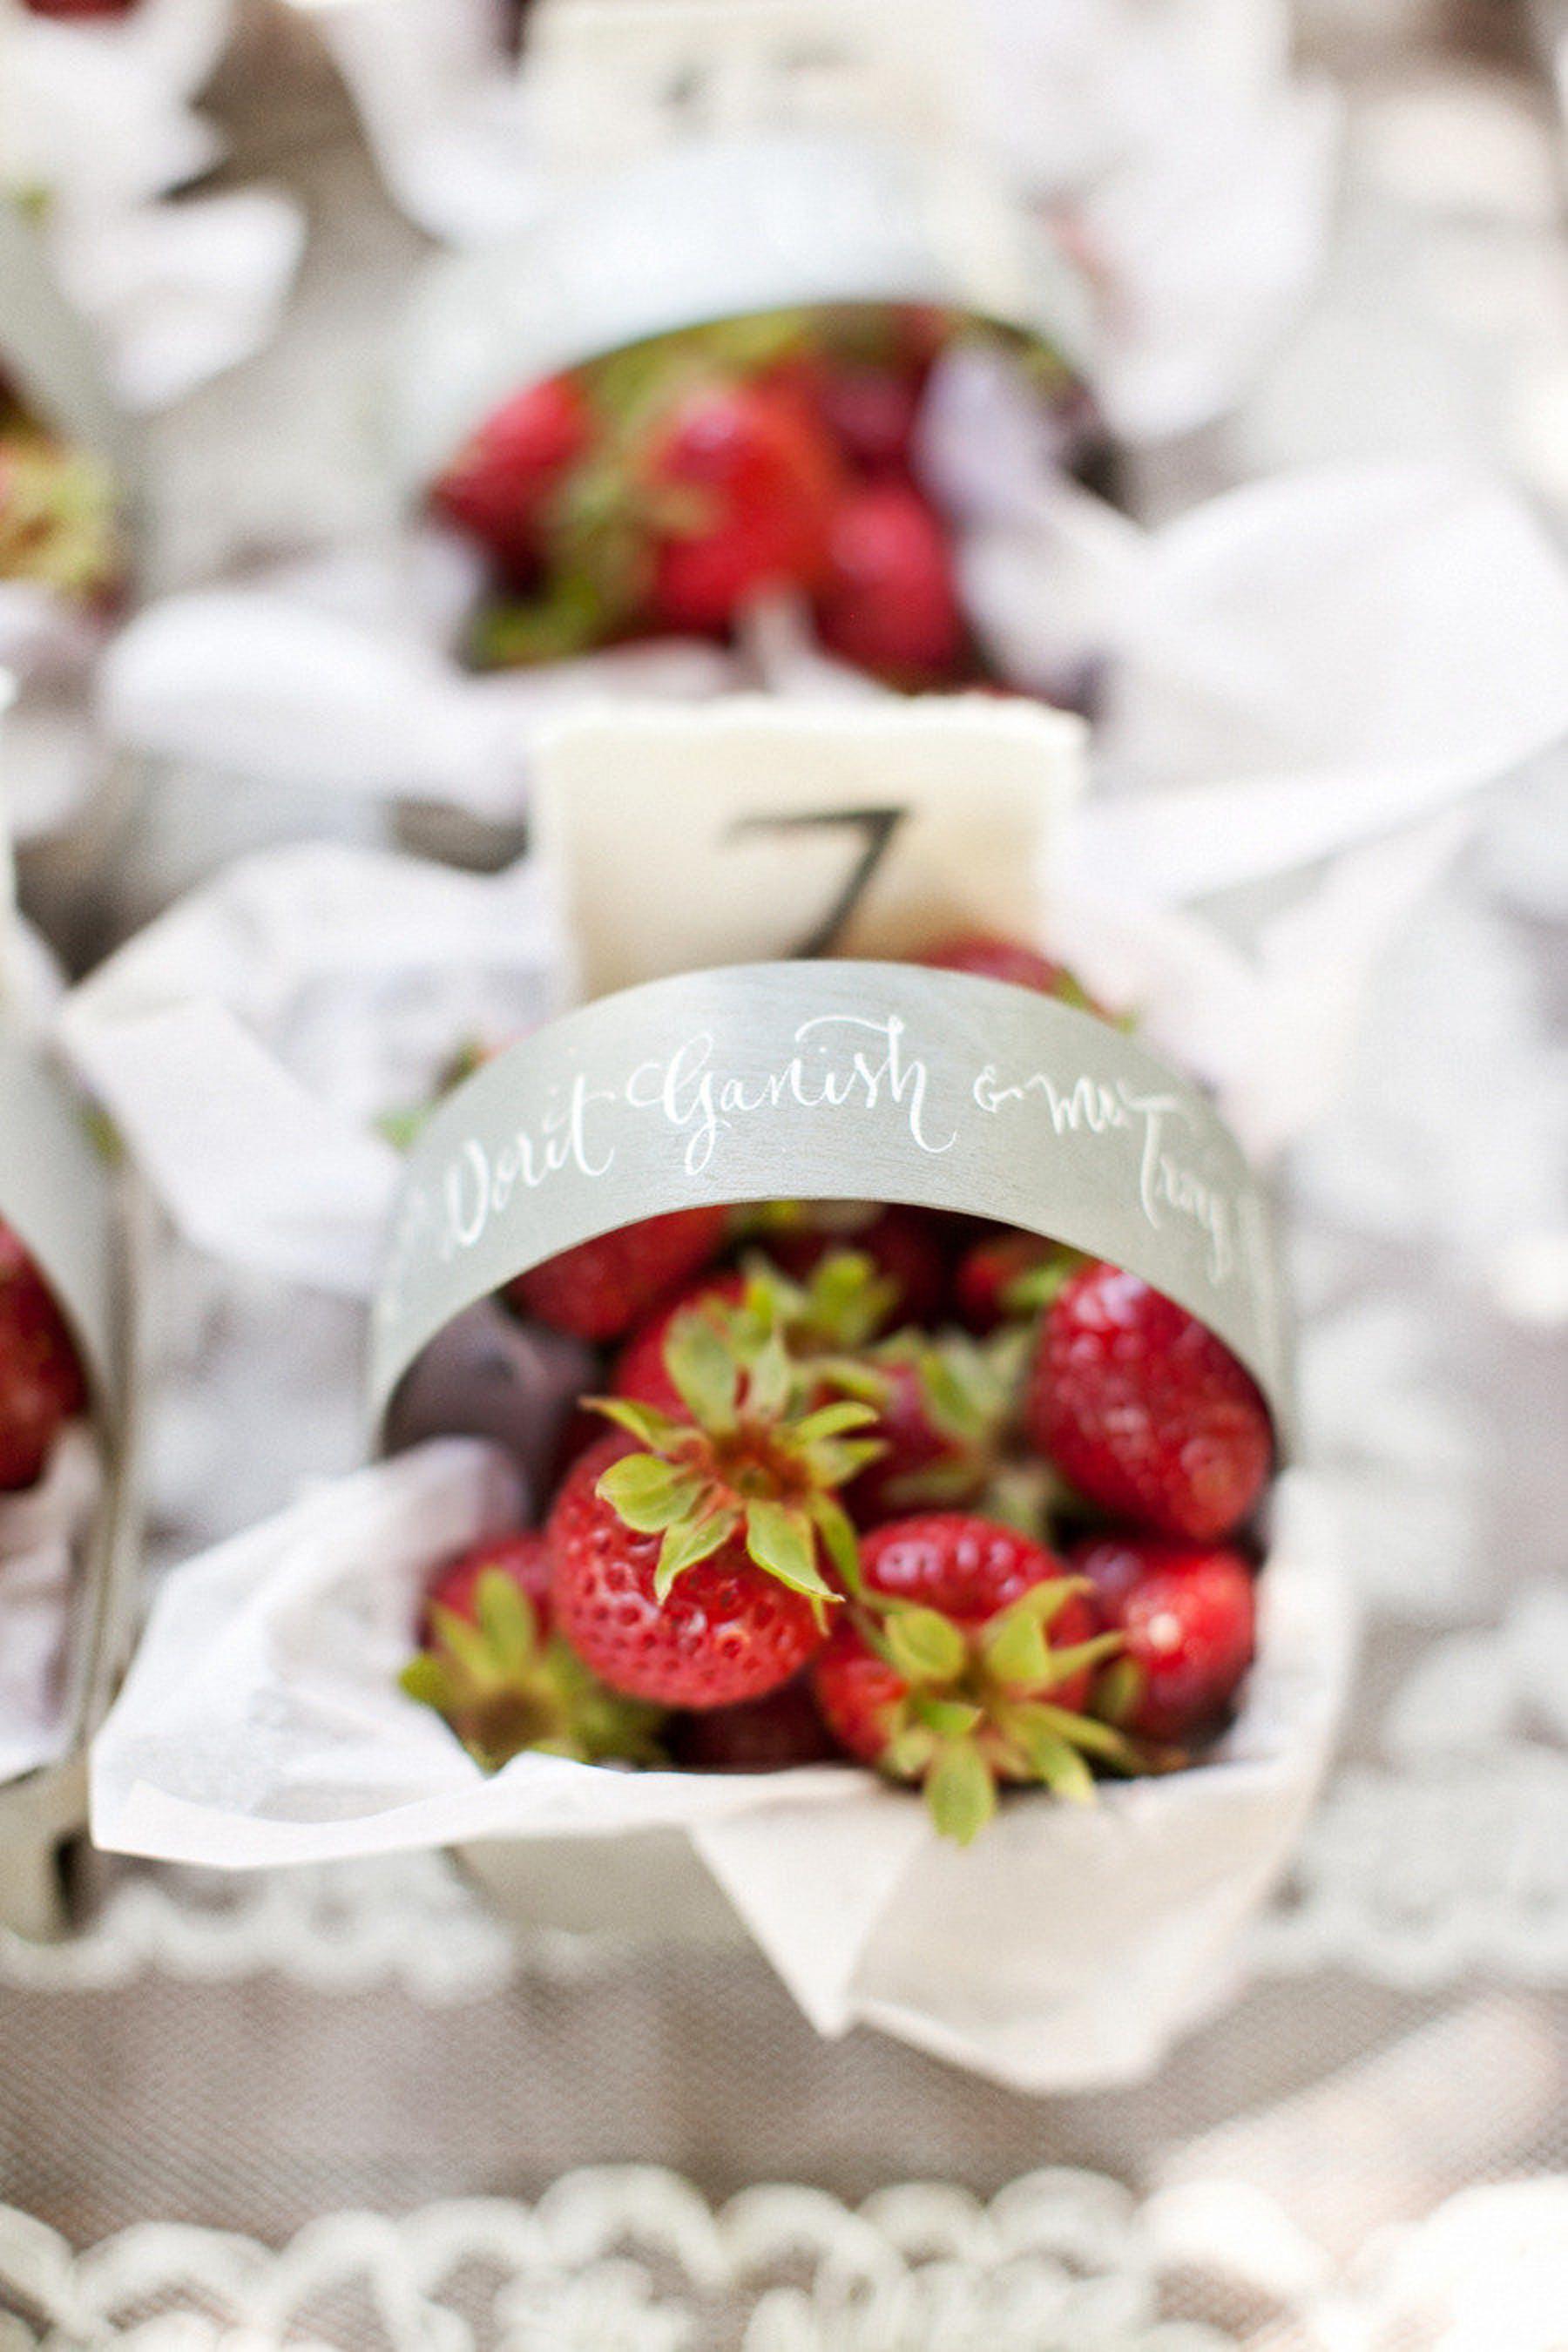 berry wedding ideas aaron delesie strawberries